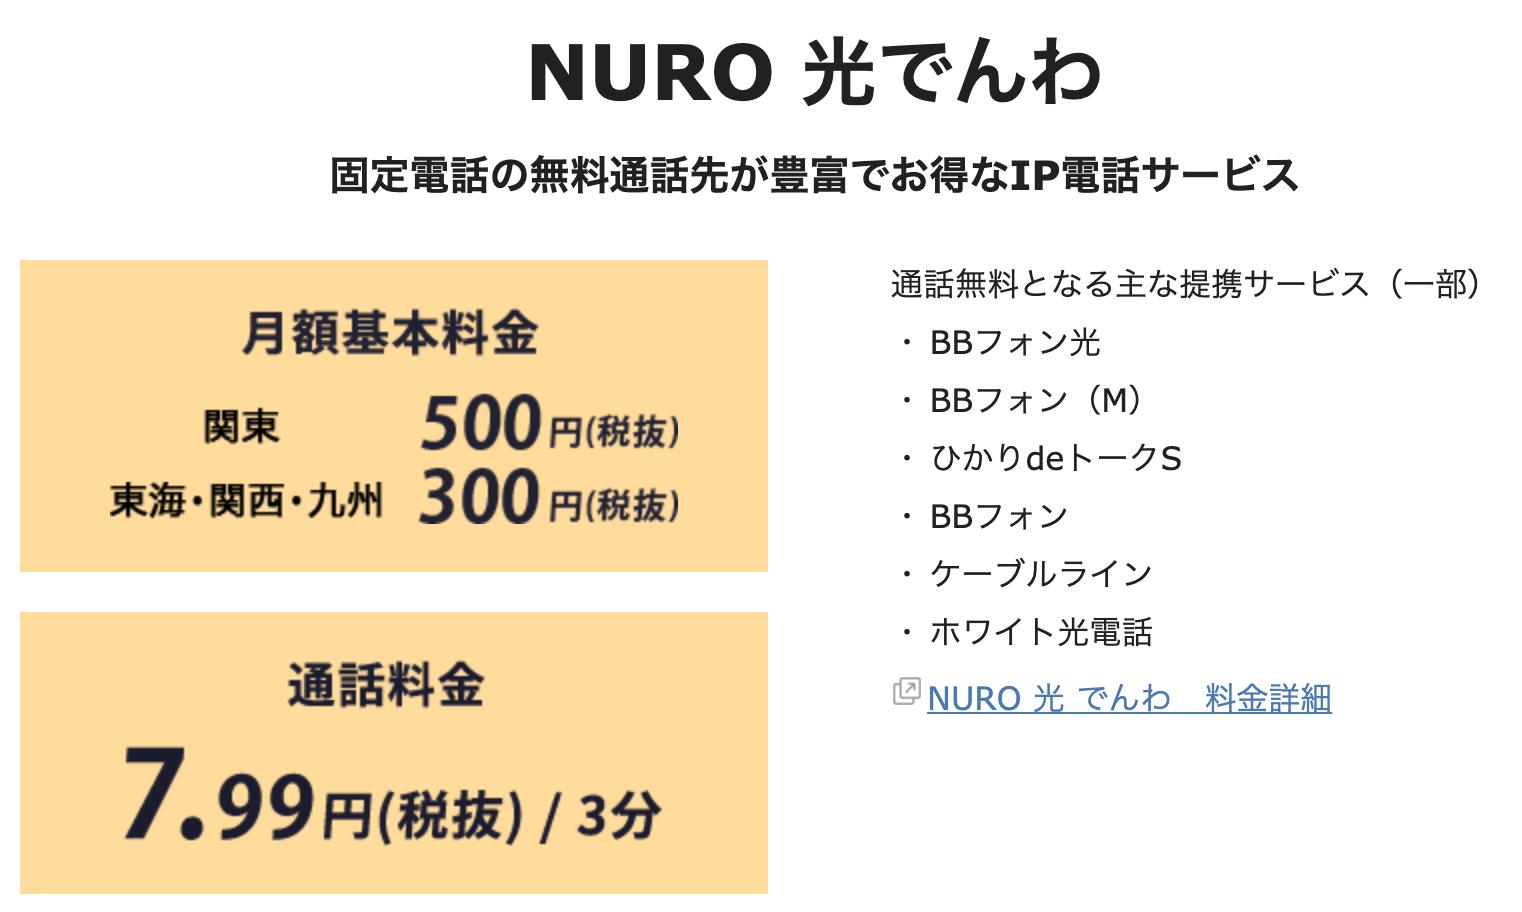 NURO光でんわ月額基本料金